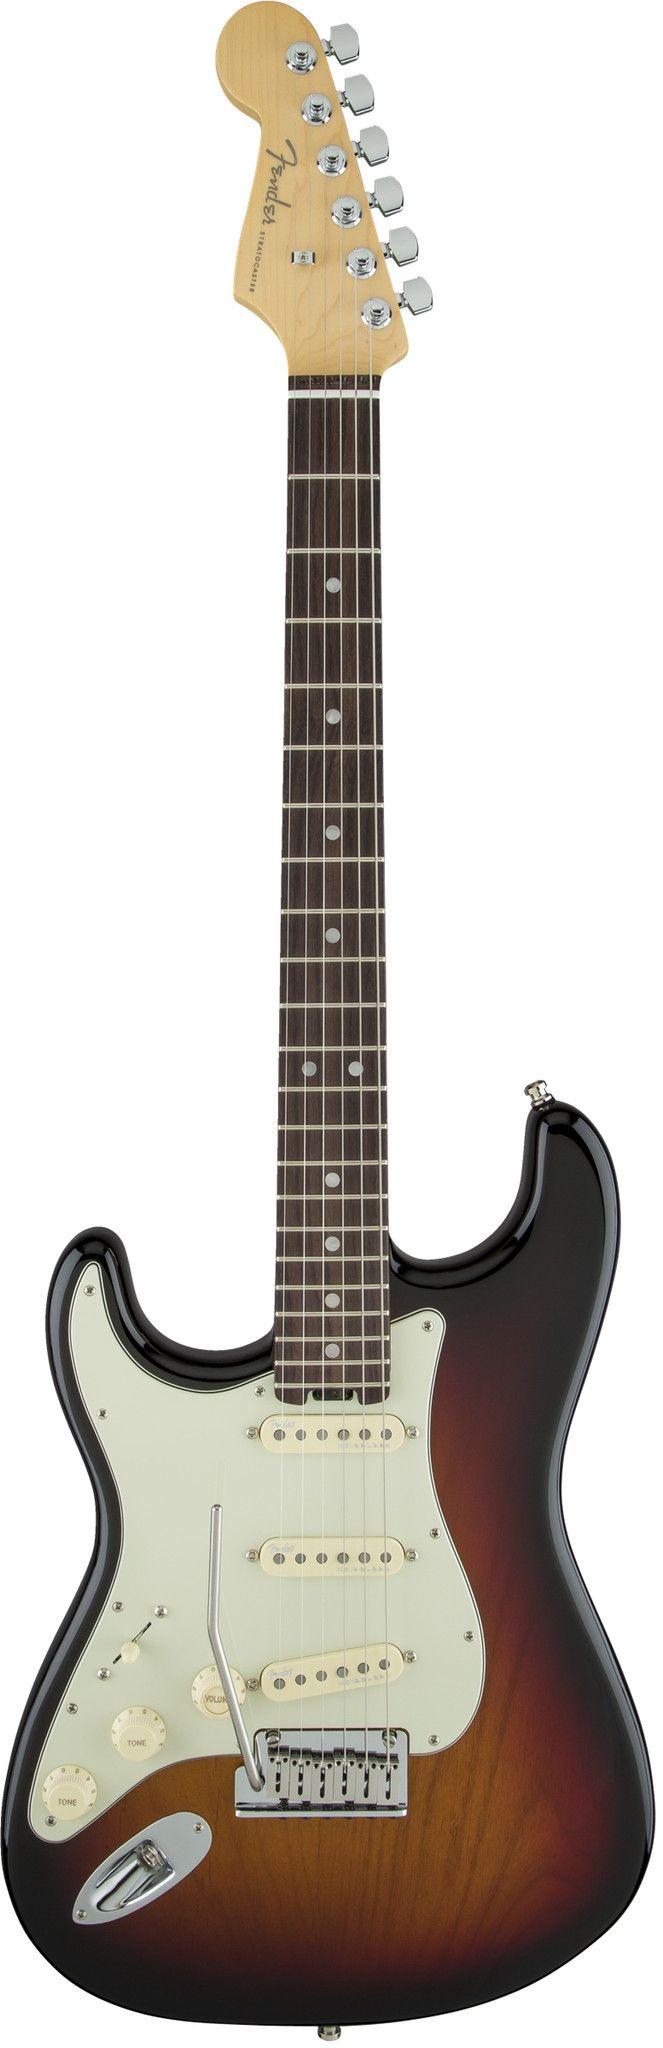 Fender Strat Pickup Wiring Diagram 2002 - All Kind Of Wiring Diagrams •